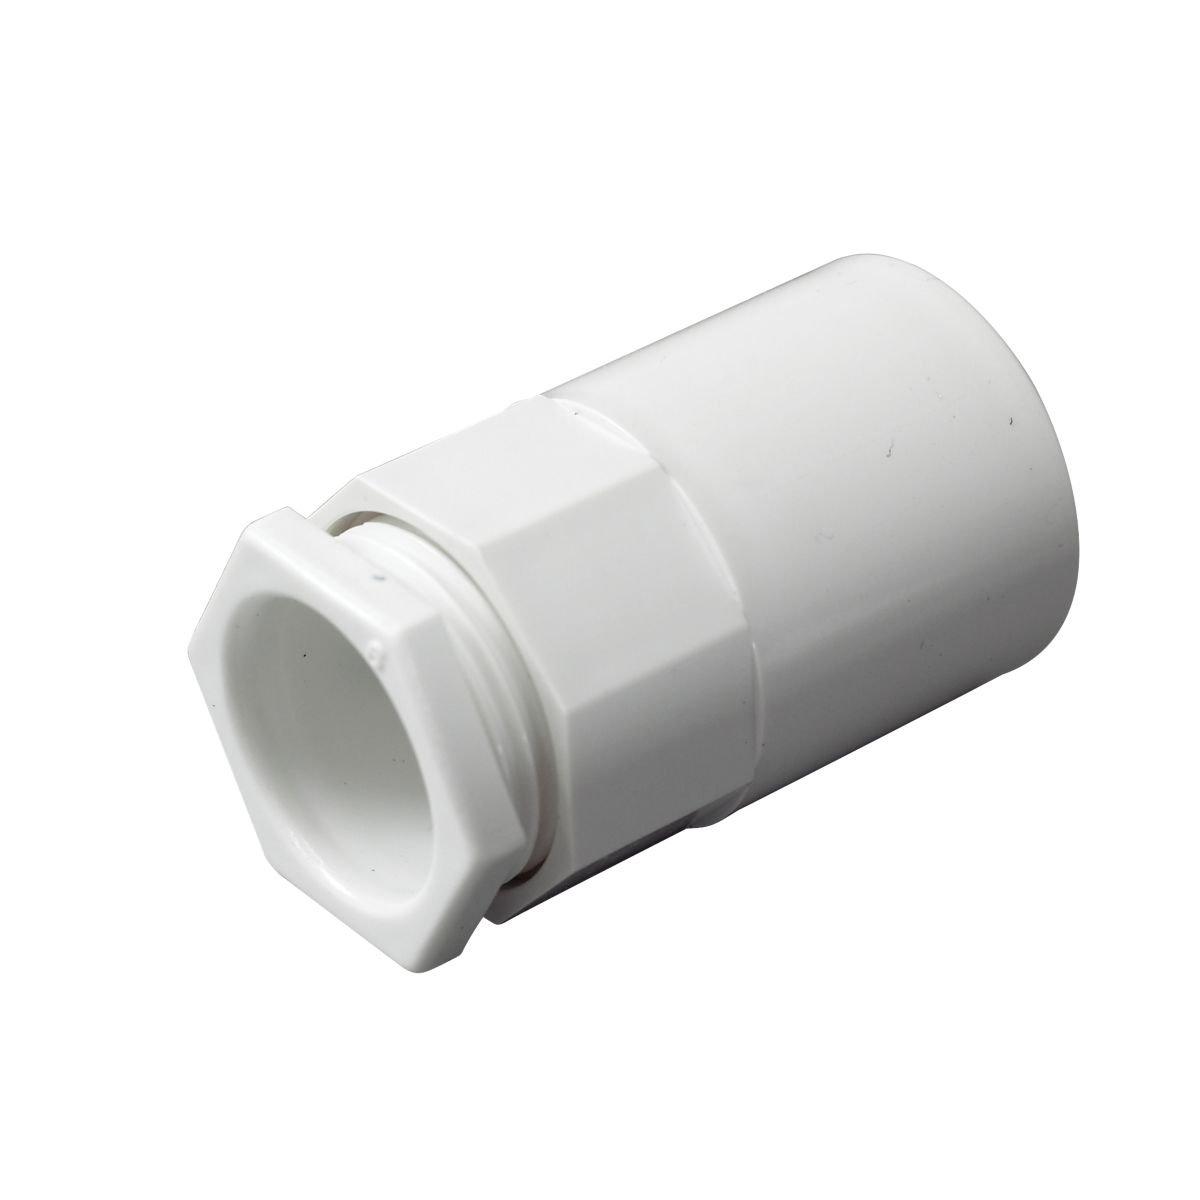 Tower Female Adaptors 20mm White Pack of 2